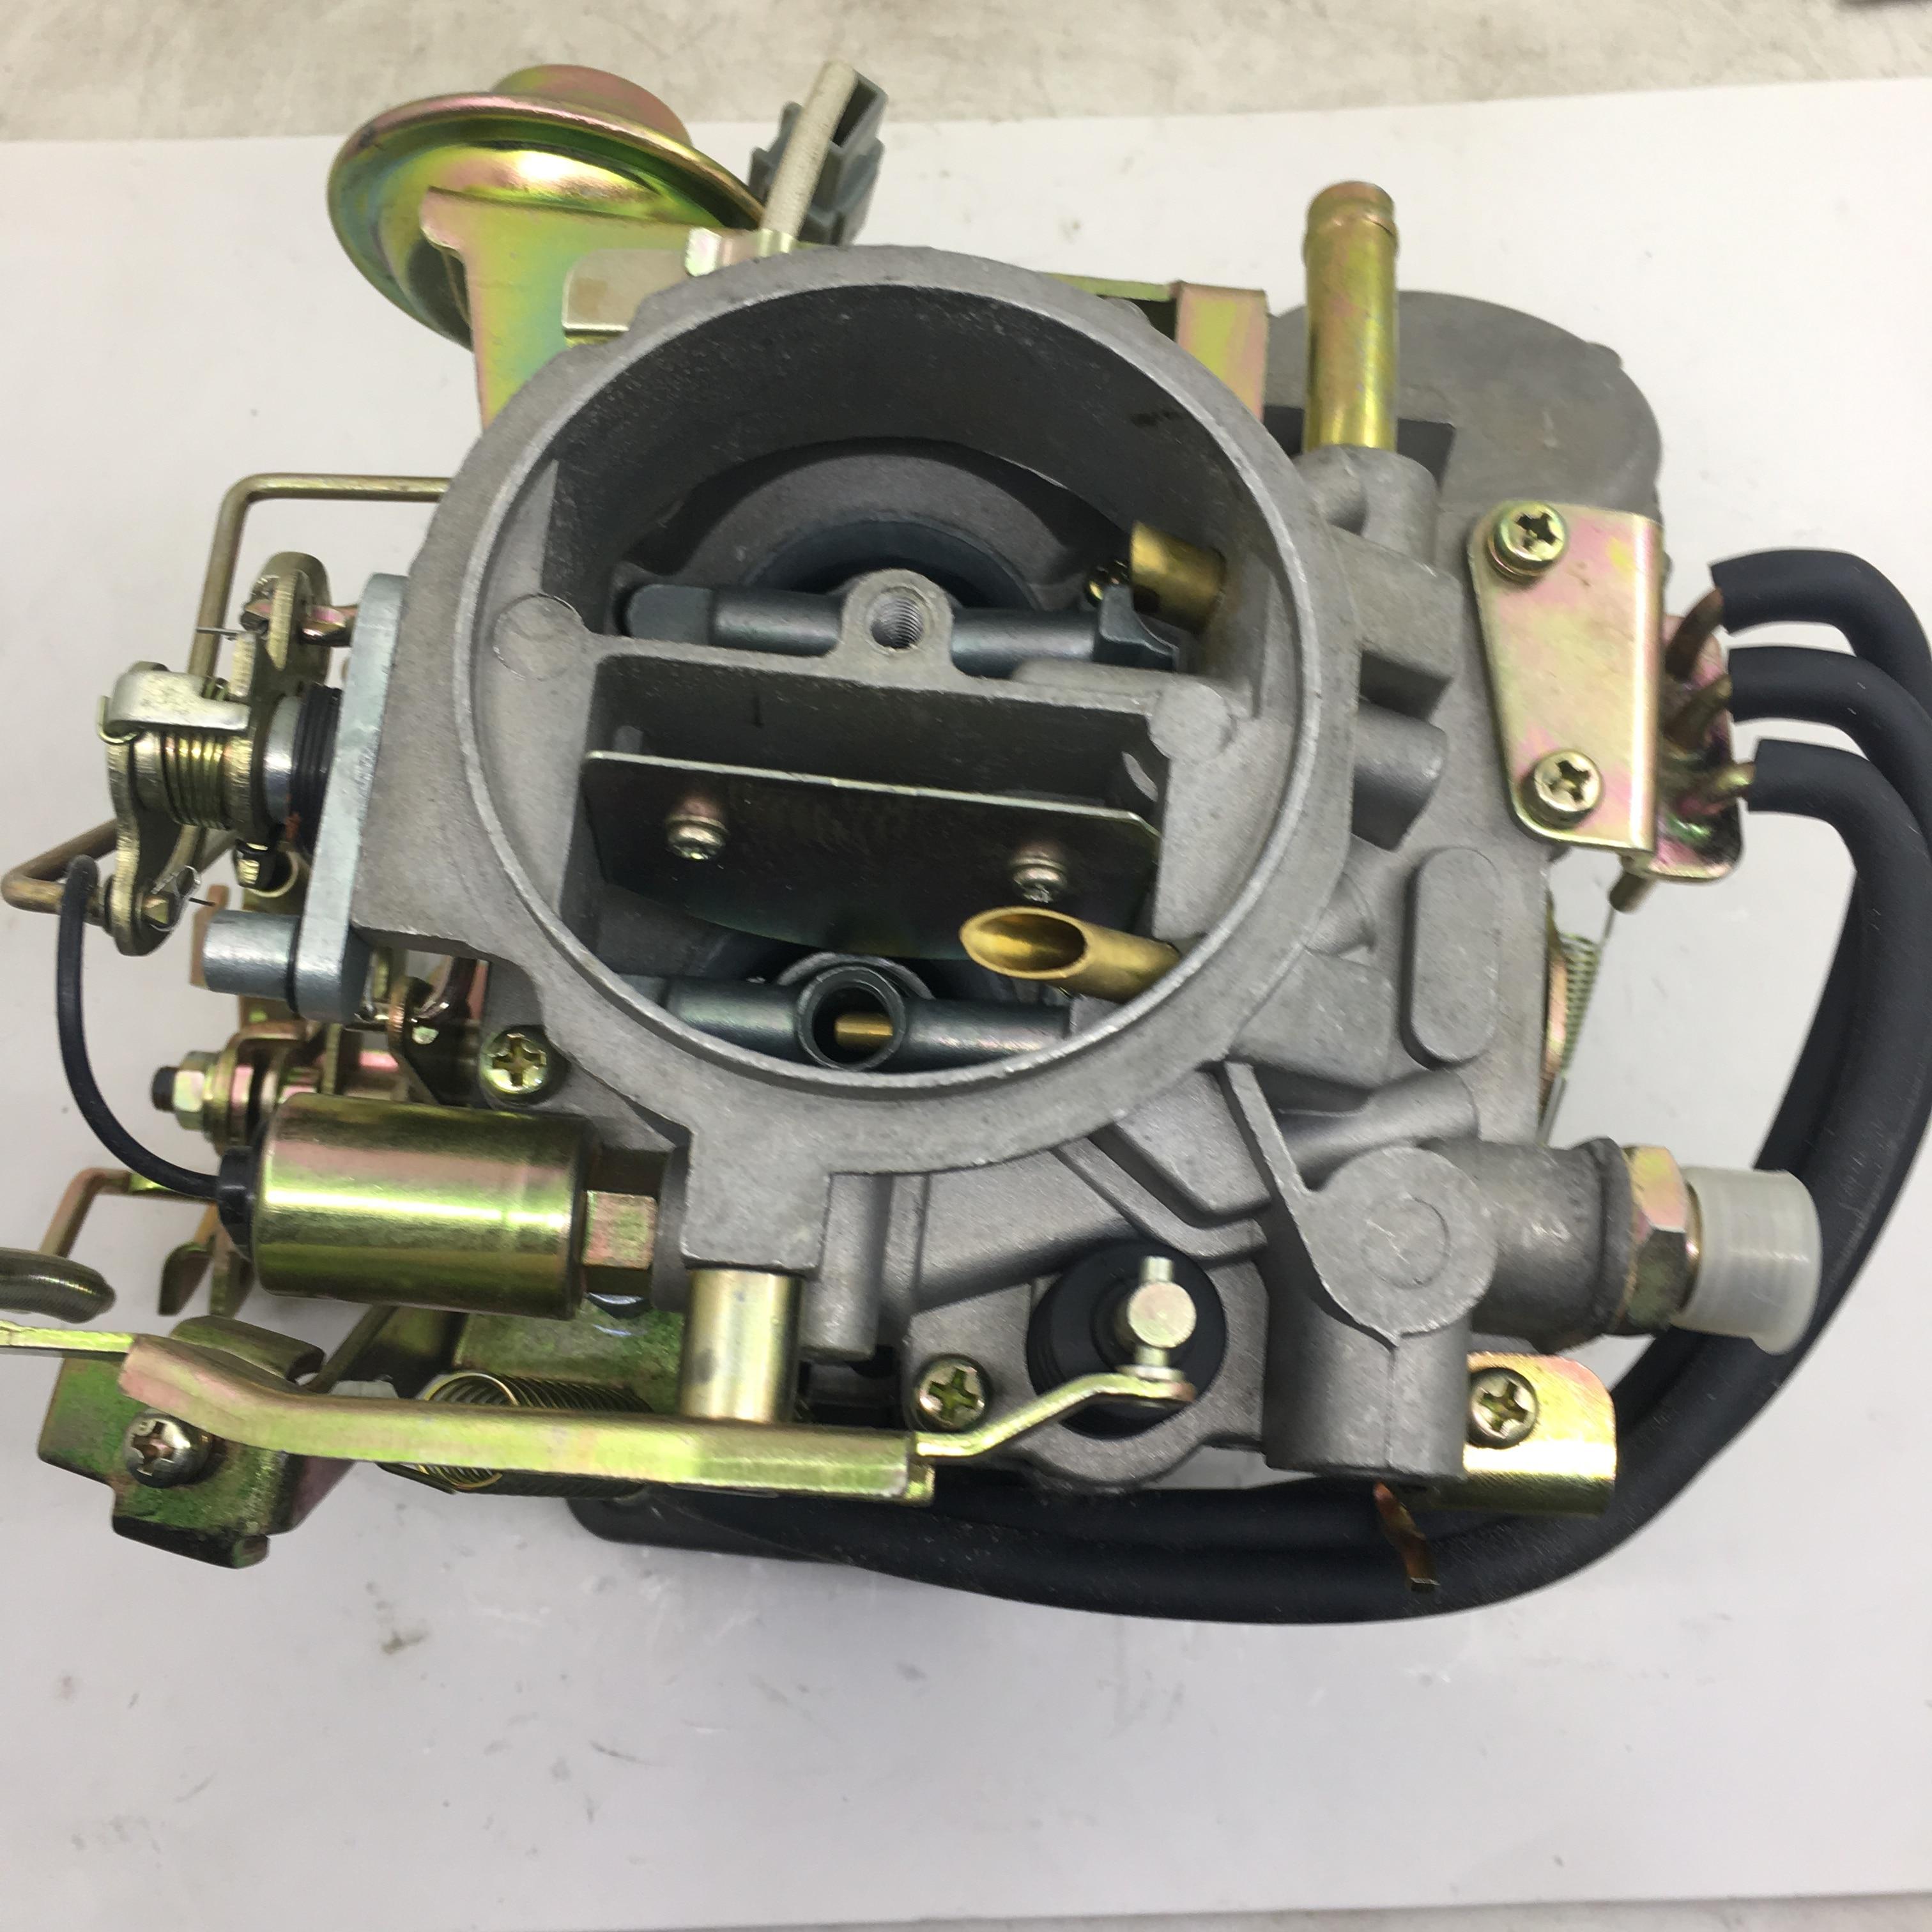 SherryBerg-carburateur carb   21100-61200 carburateur pour TOYOTA 3F /4F 4,0l, LANDCRUISER au gaz 1988-1992 carburateur